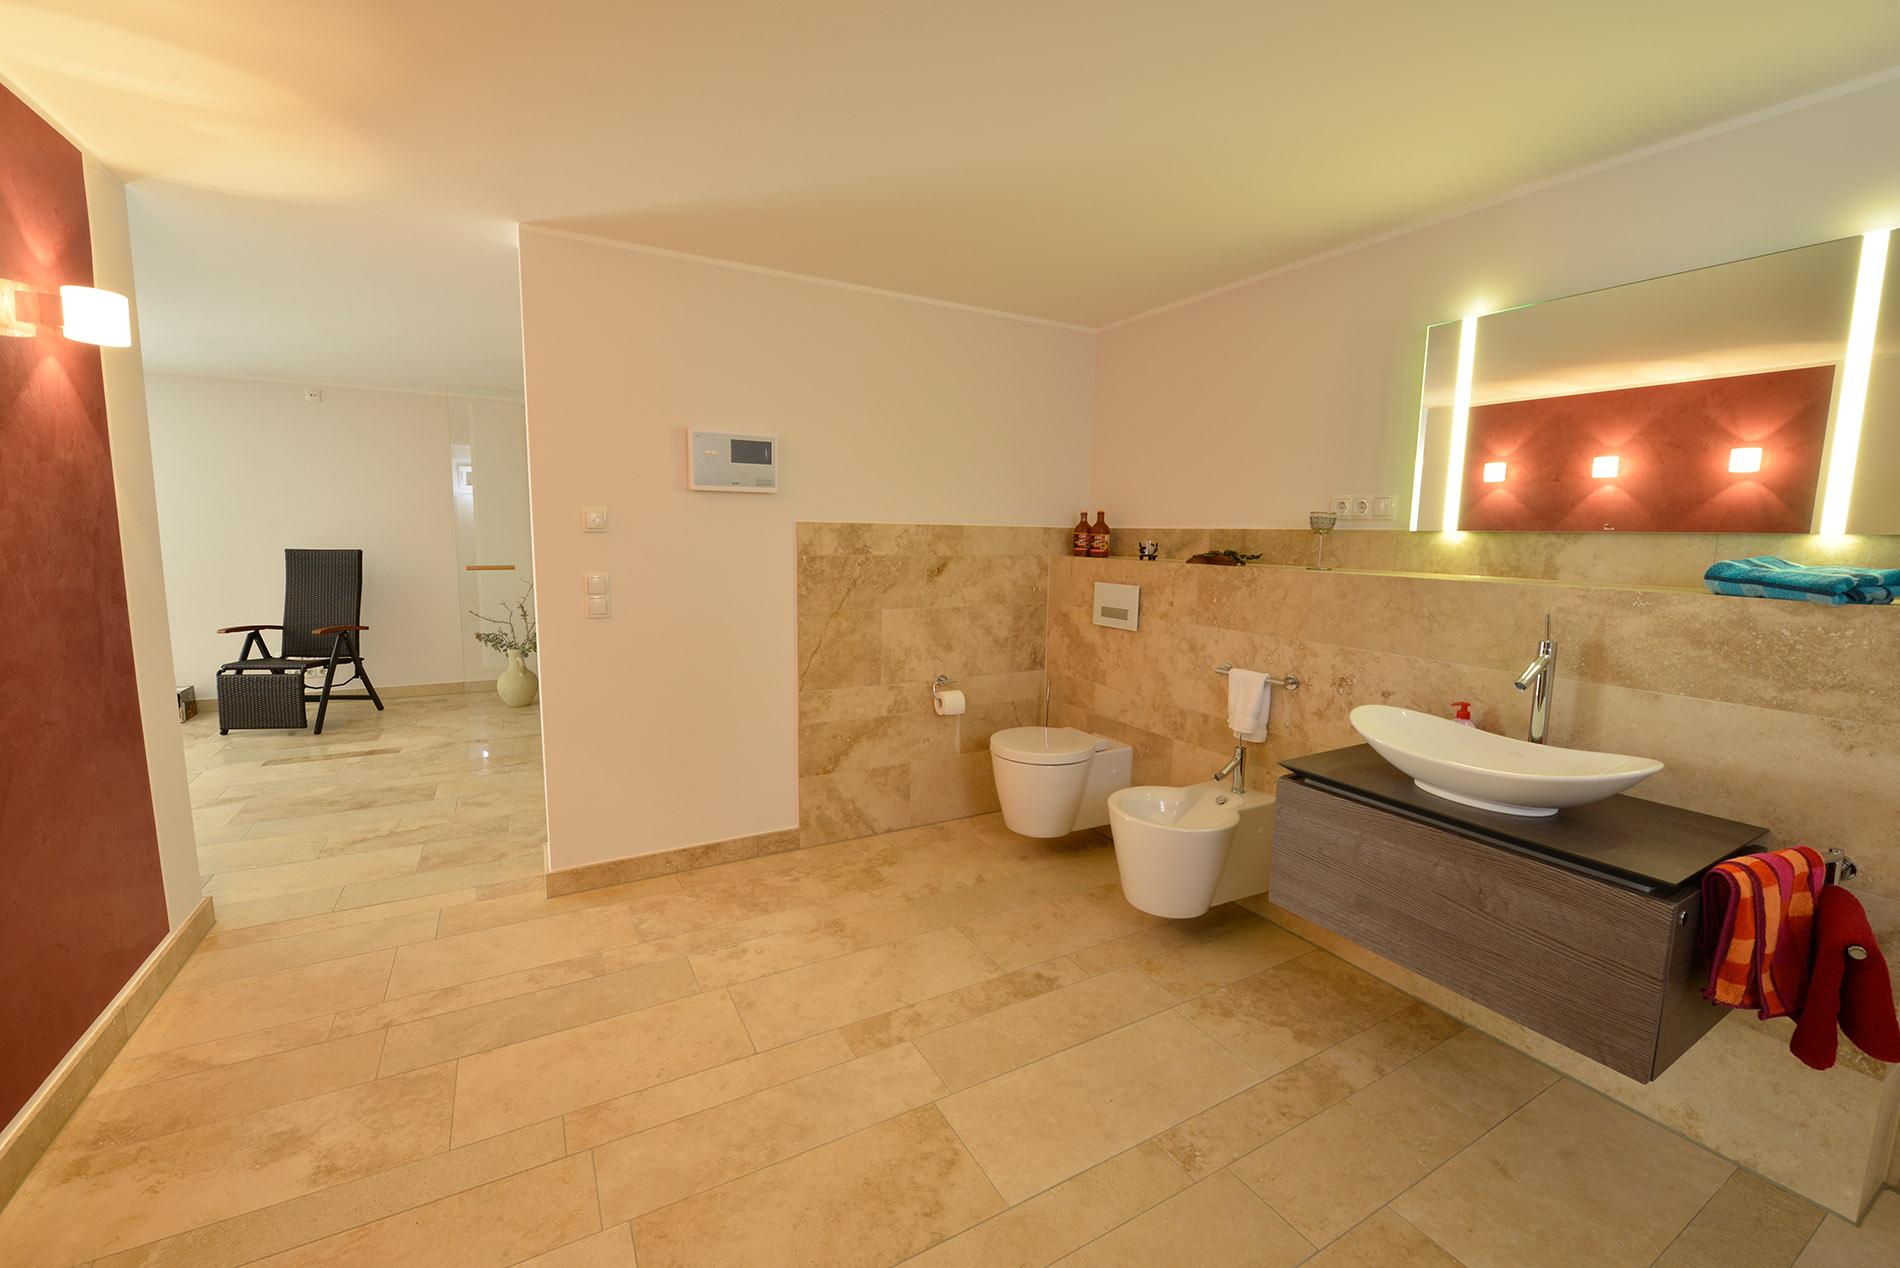 villa und stein traco. Black Bedroom Furniture Sets. Home Design Ideas